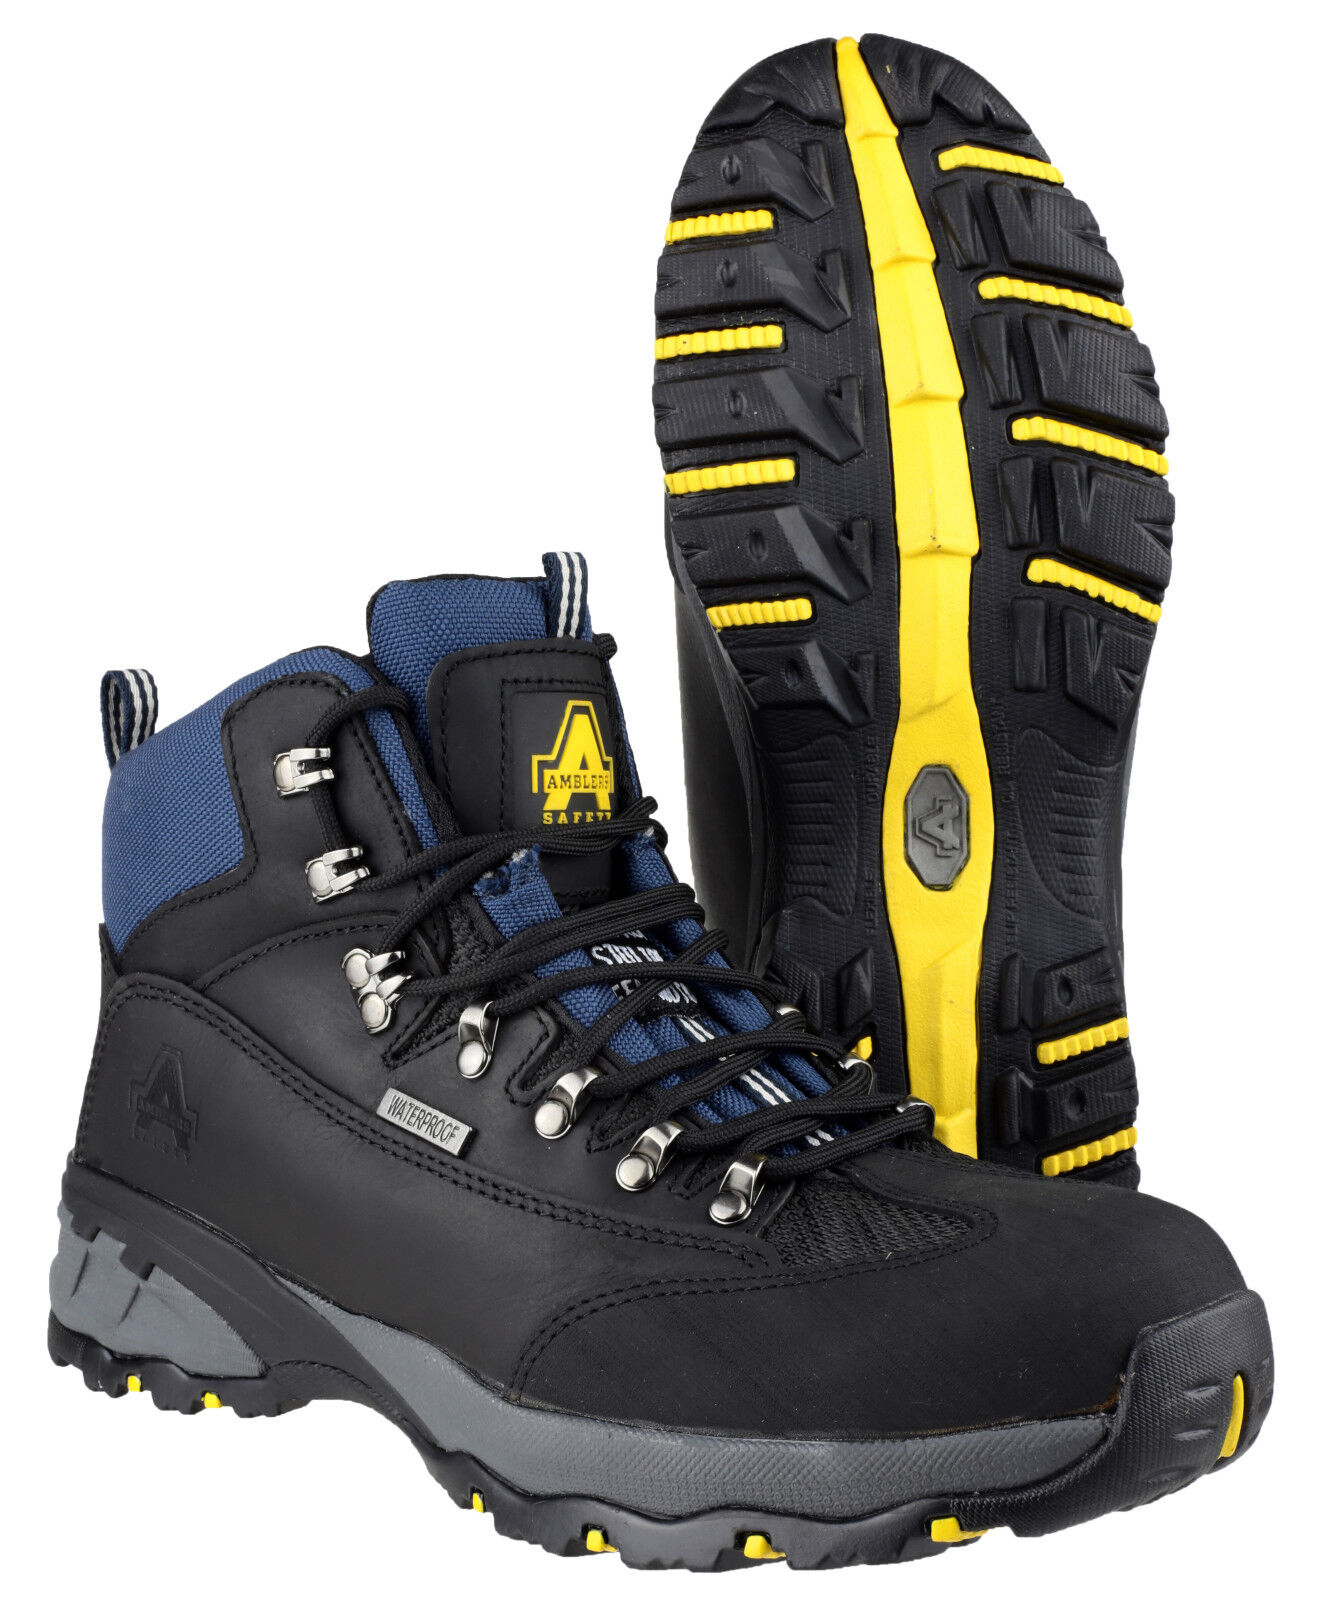 Amblers FS161 Waterproof Safety Mens Steel Toe Cap Walking Hiking Boots UK4-12